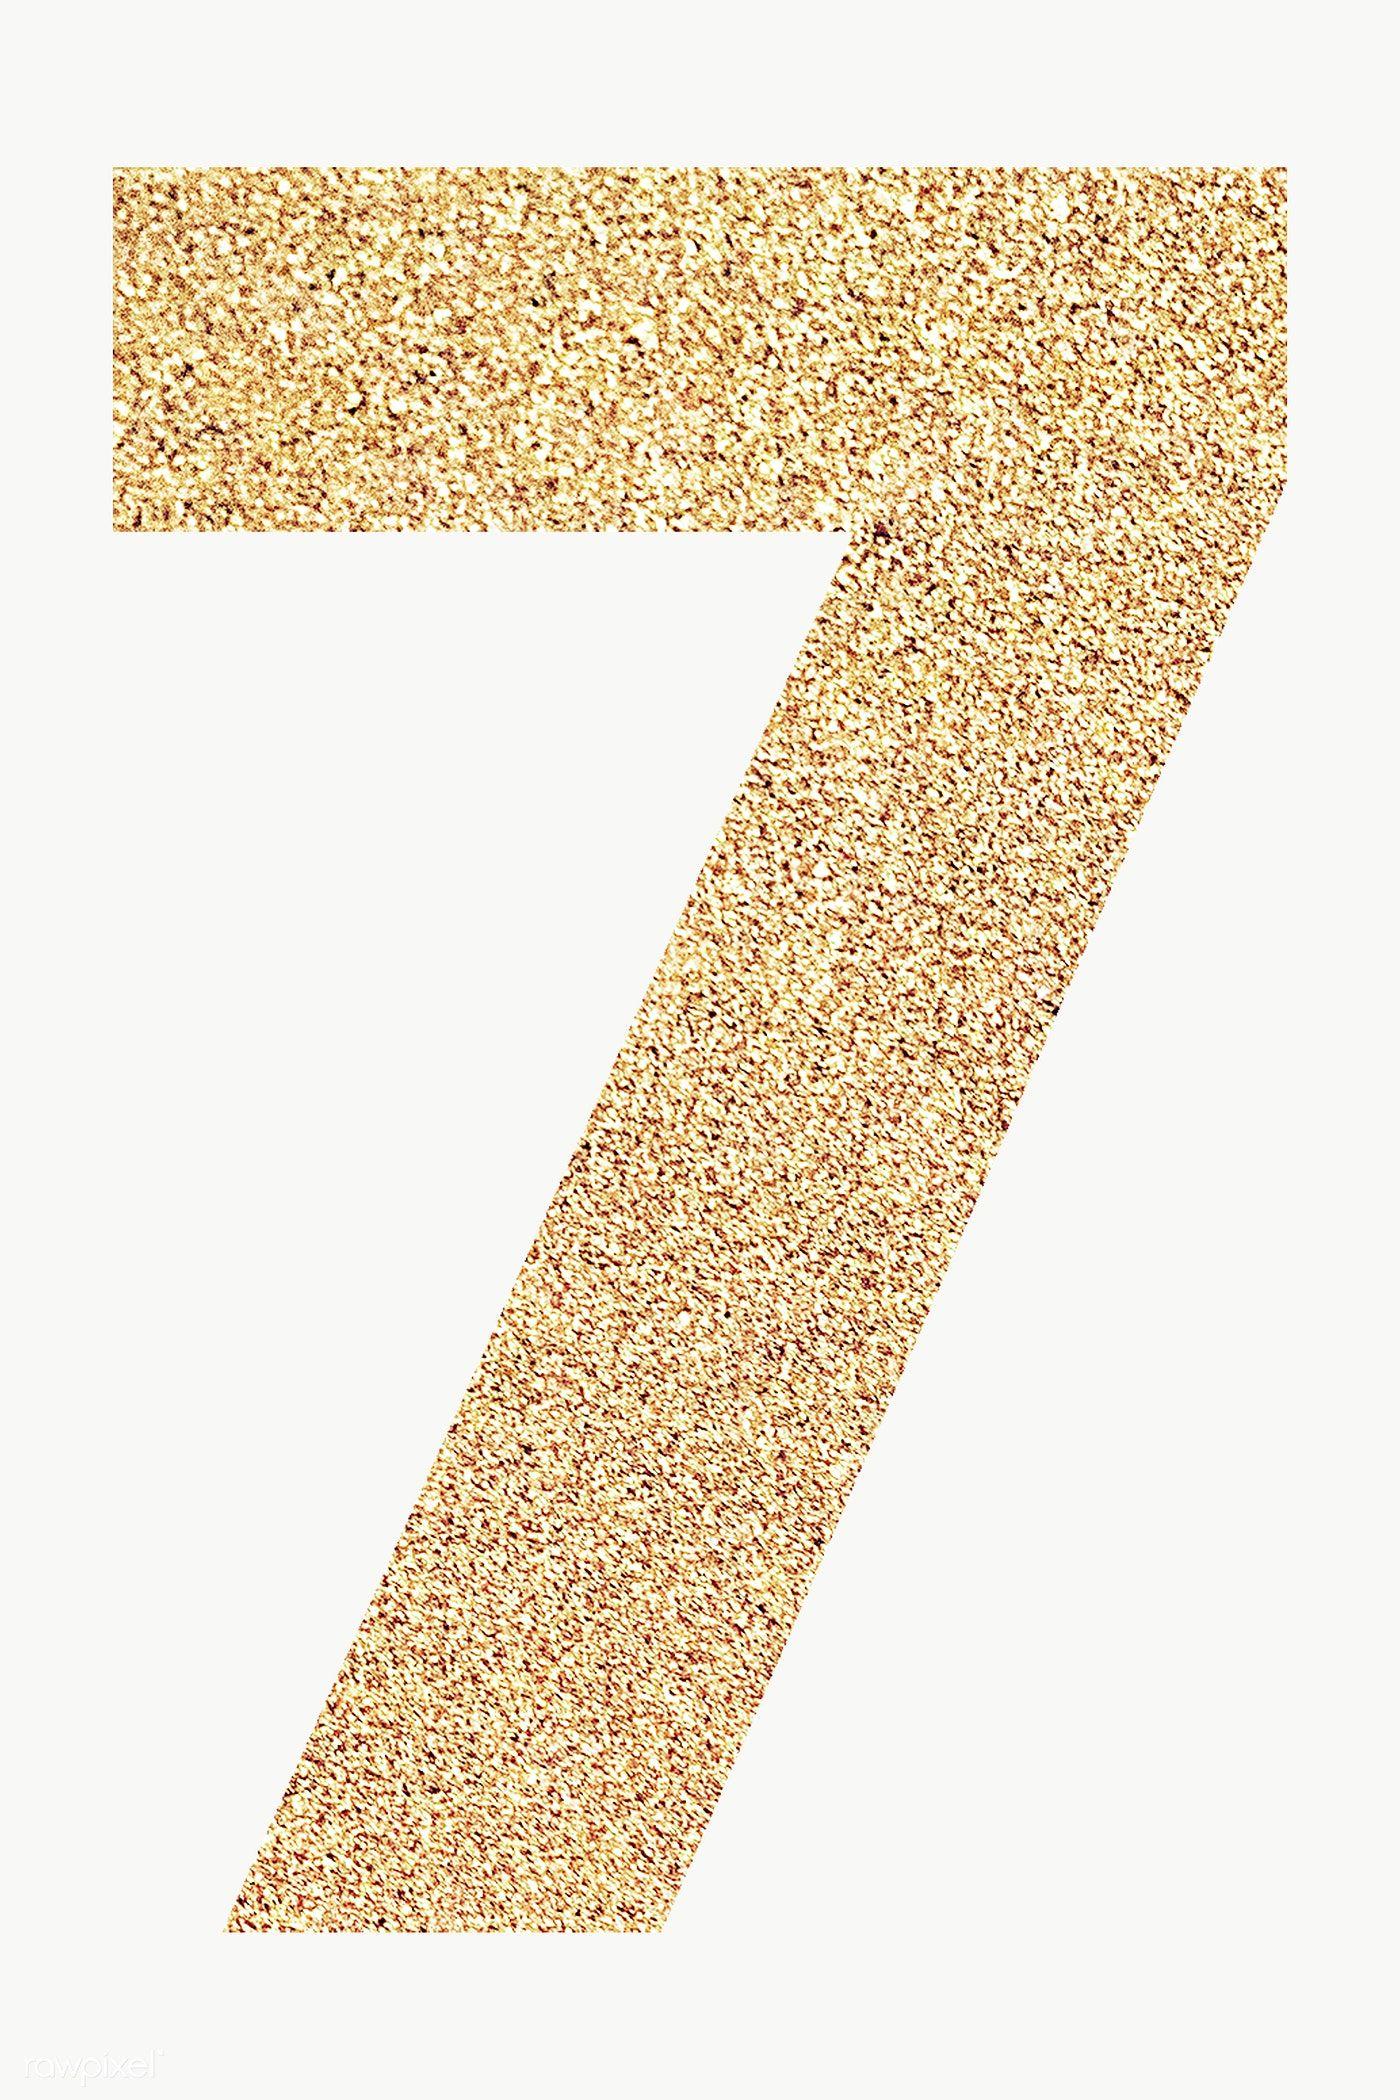 Glitter Gold Number 7 Typography Transparent Png Free Image By Rawpixel Com Ningzk V Image Glitter Gold Number Sparkle Png